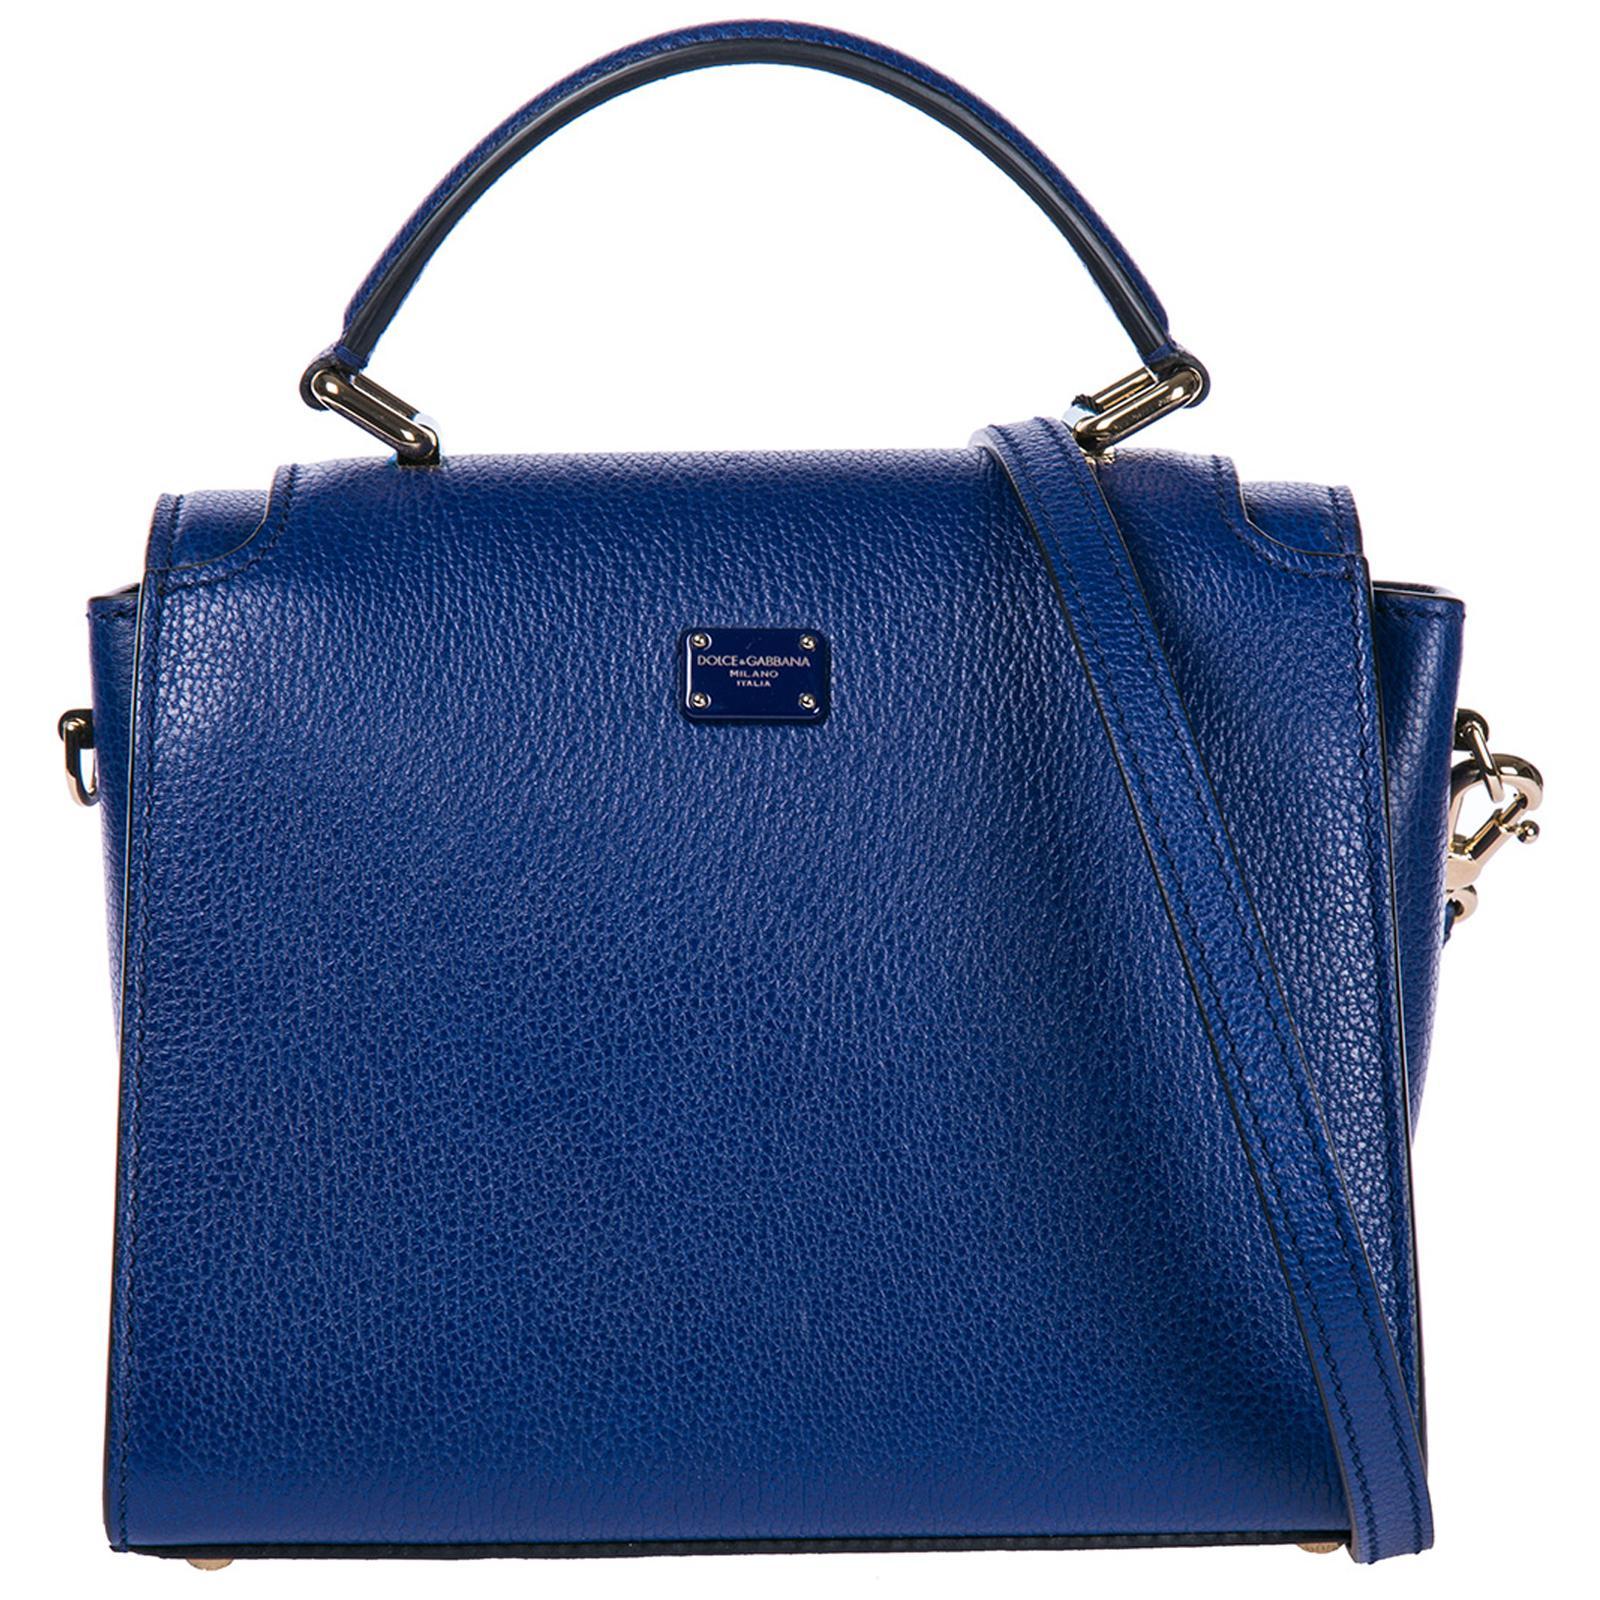 2c61ca0dca Dolce   Gabbana - Blue Leather Handbag Shopping Bag Purse Greta - Lyst.  View fullscreen